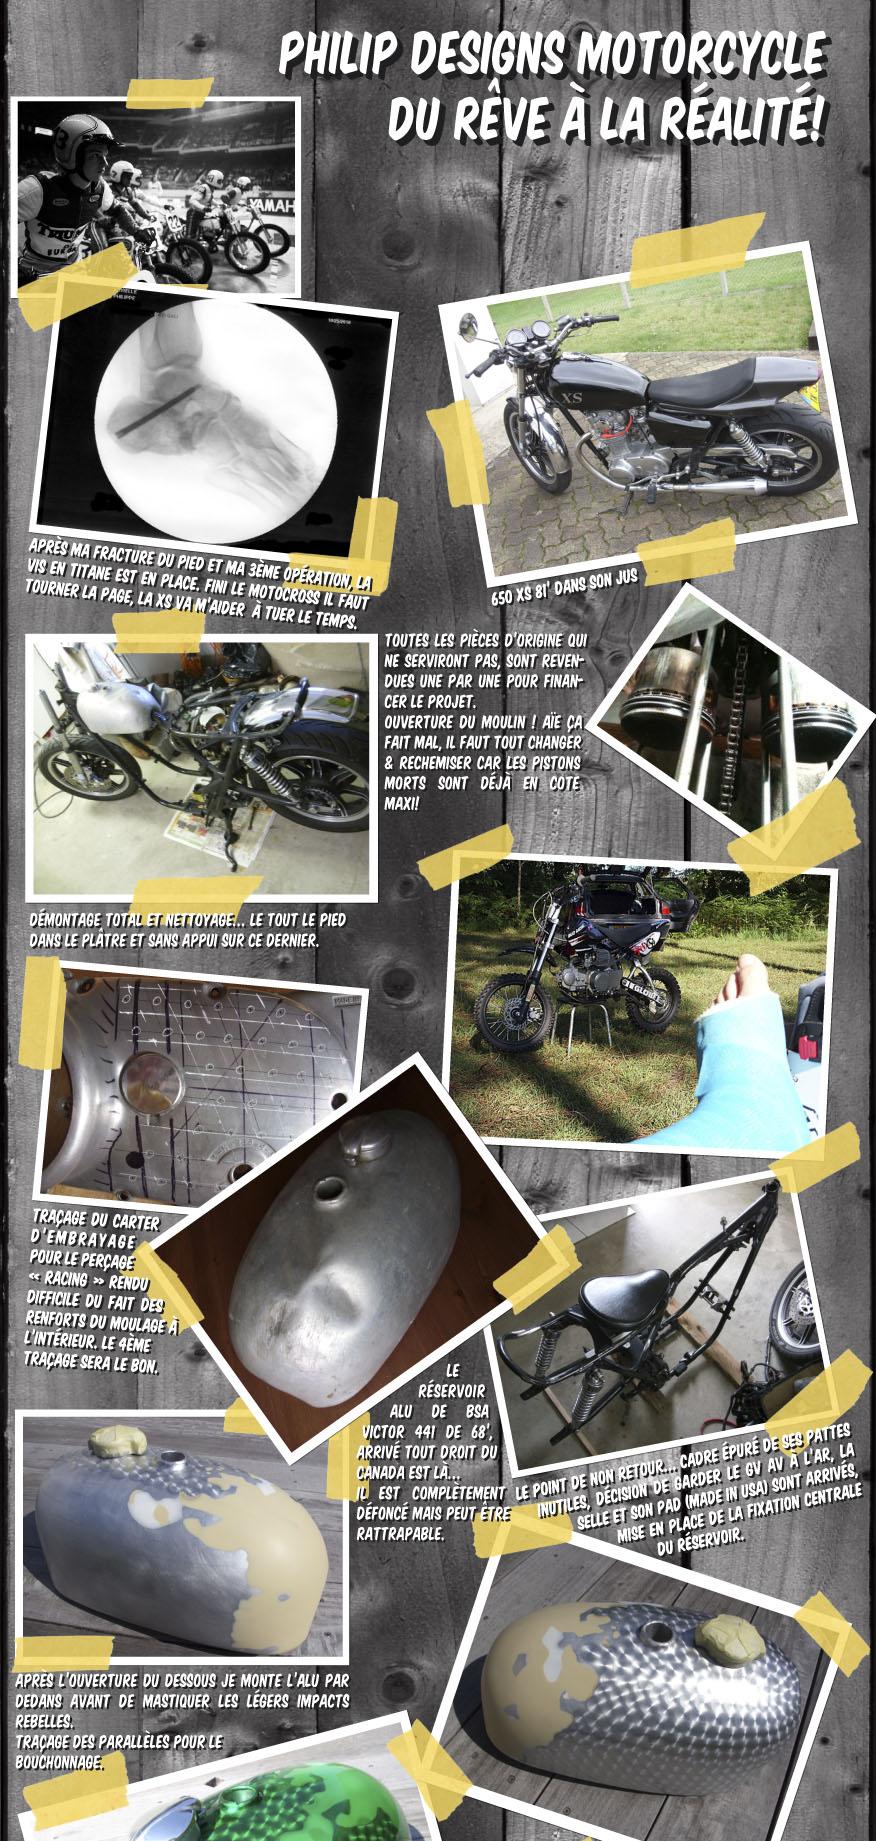 philip designs motorcycle yamaha 650 xs 3L1